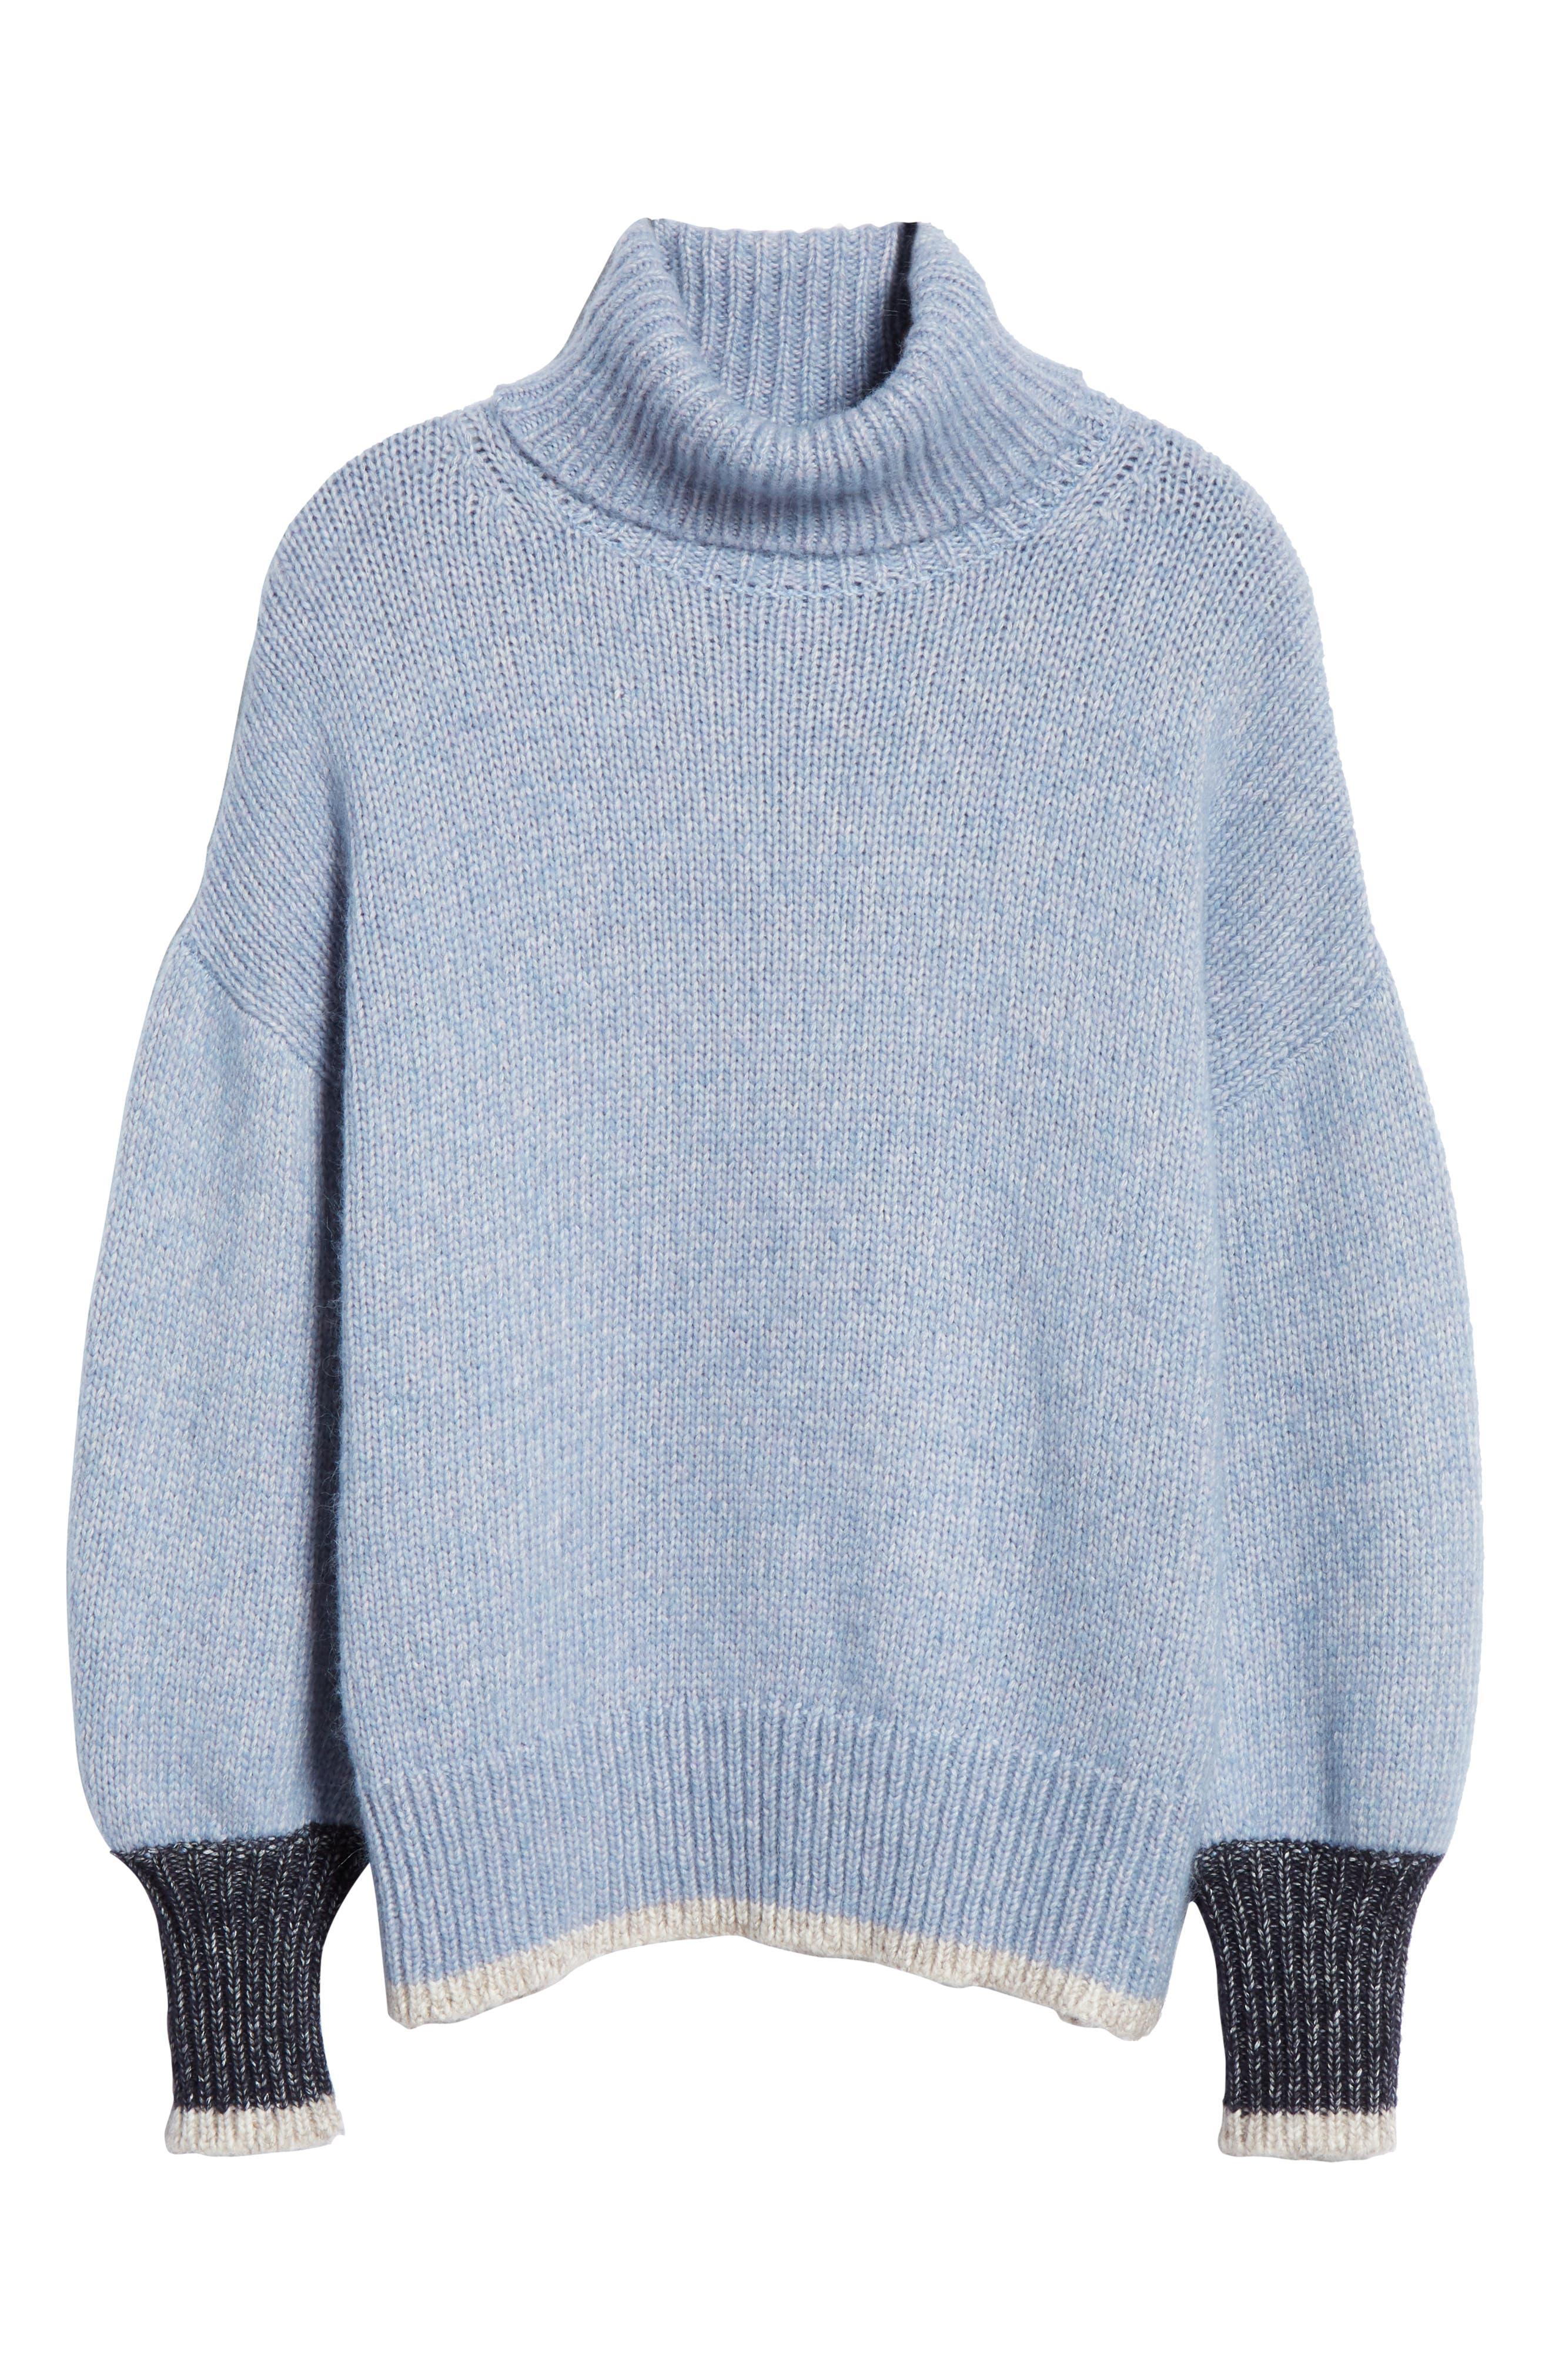 ,                             Oversize Turtleneck Sweater,                             Alternate thumbnail 6, color,                             LIGHT BLUE/ CREAM/ NAVY